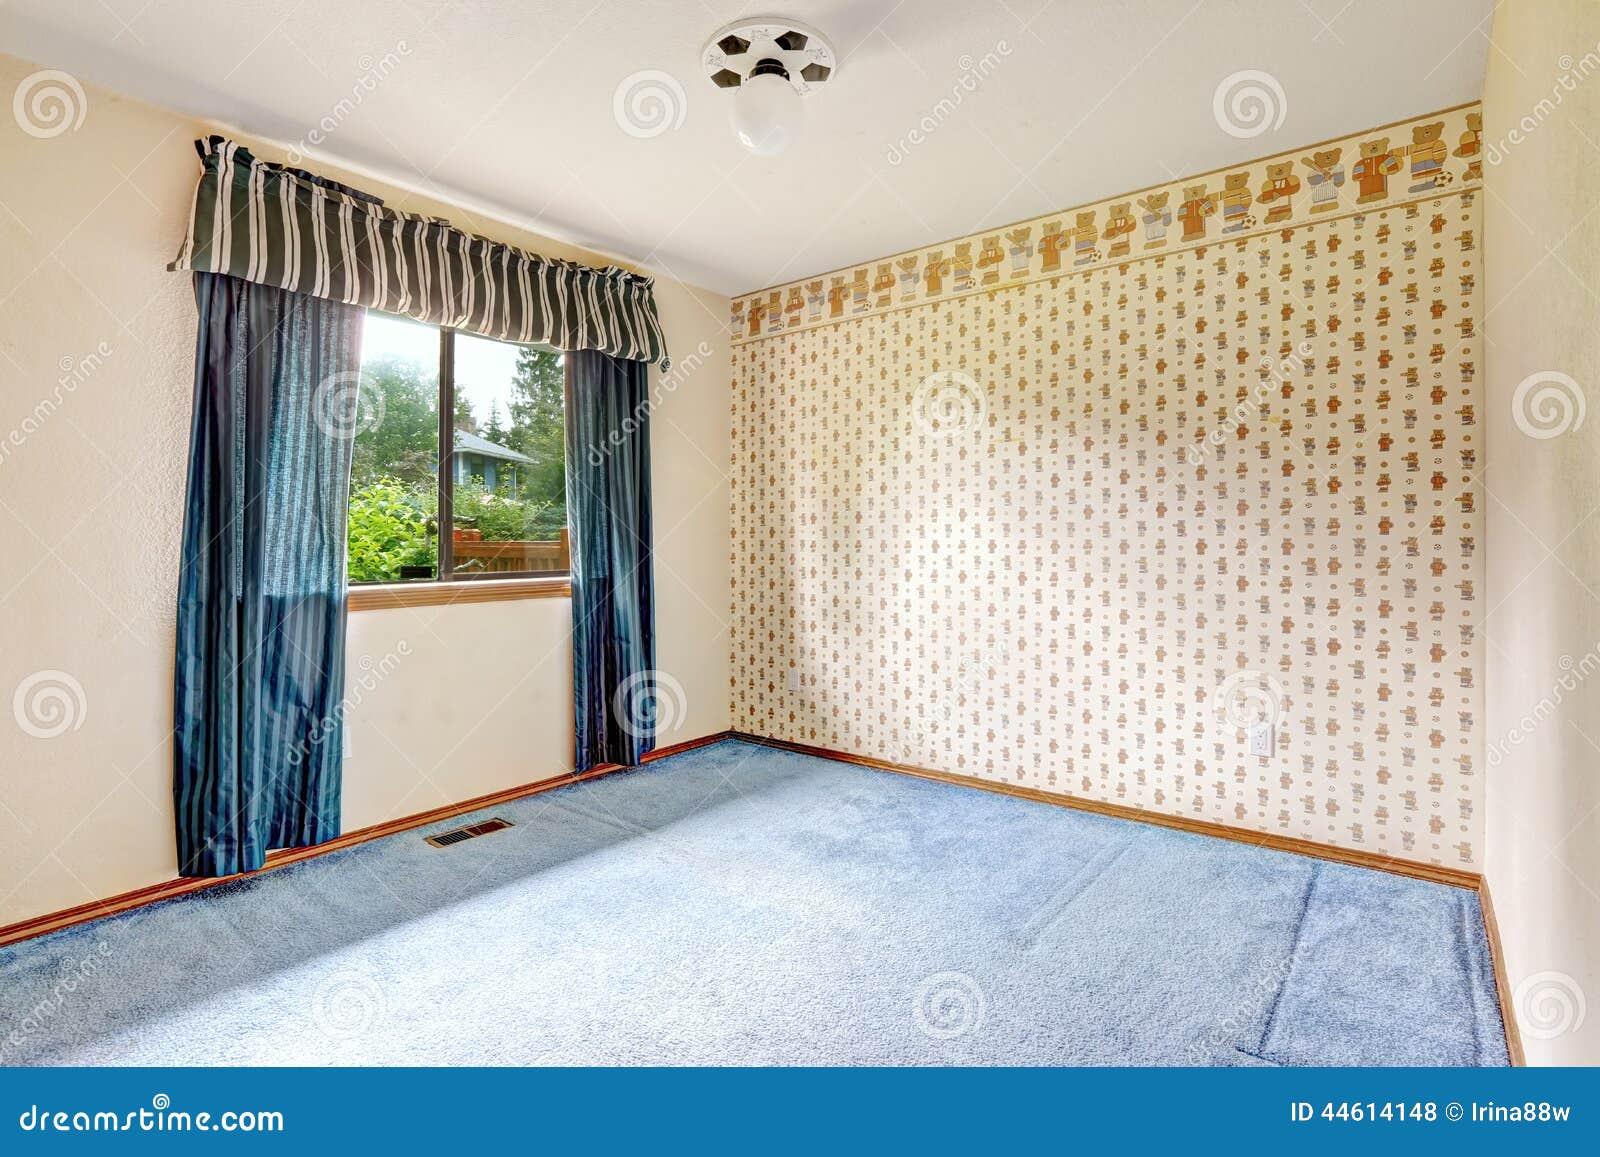 empty room wallpaper 1710x1226 - photo #15